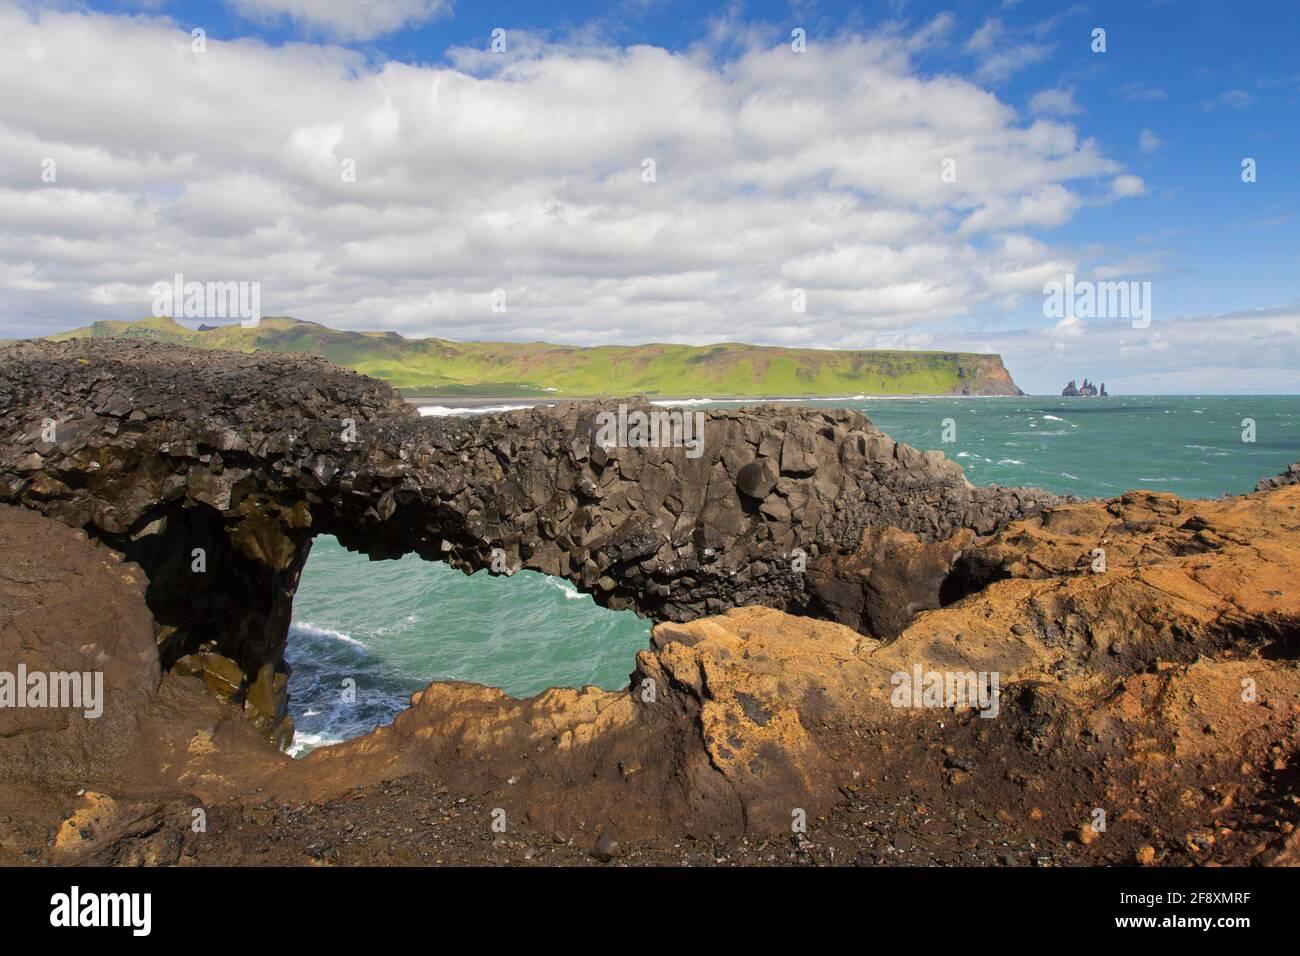 Arco natural, formación de roca de basalto negro erosionada en Cabo Dyrhólaey / Cabo Portland cerca de Vík í Mýrdal, Islandia Foto de stock